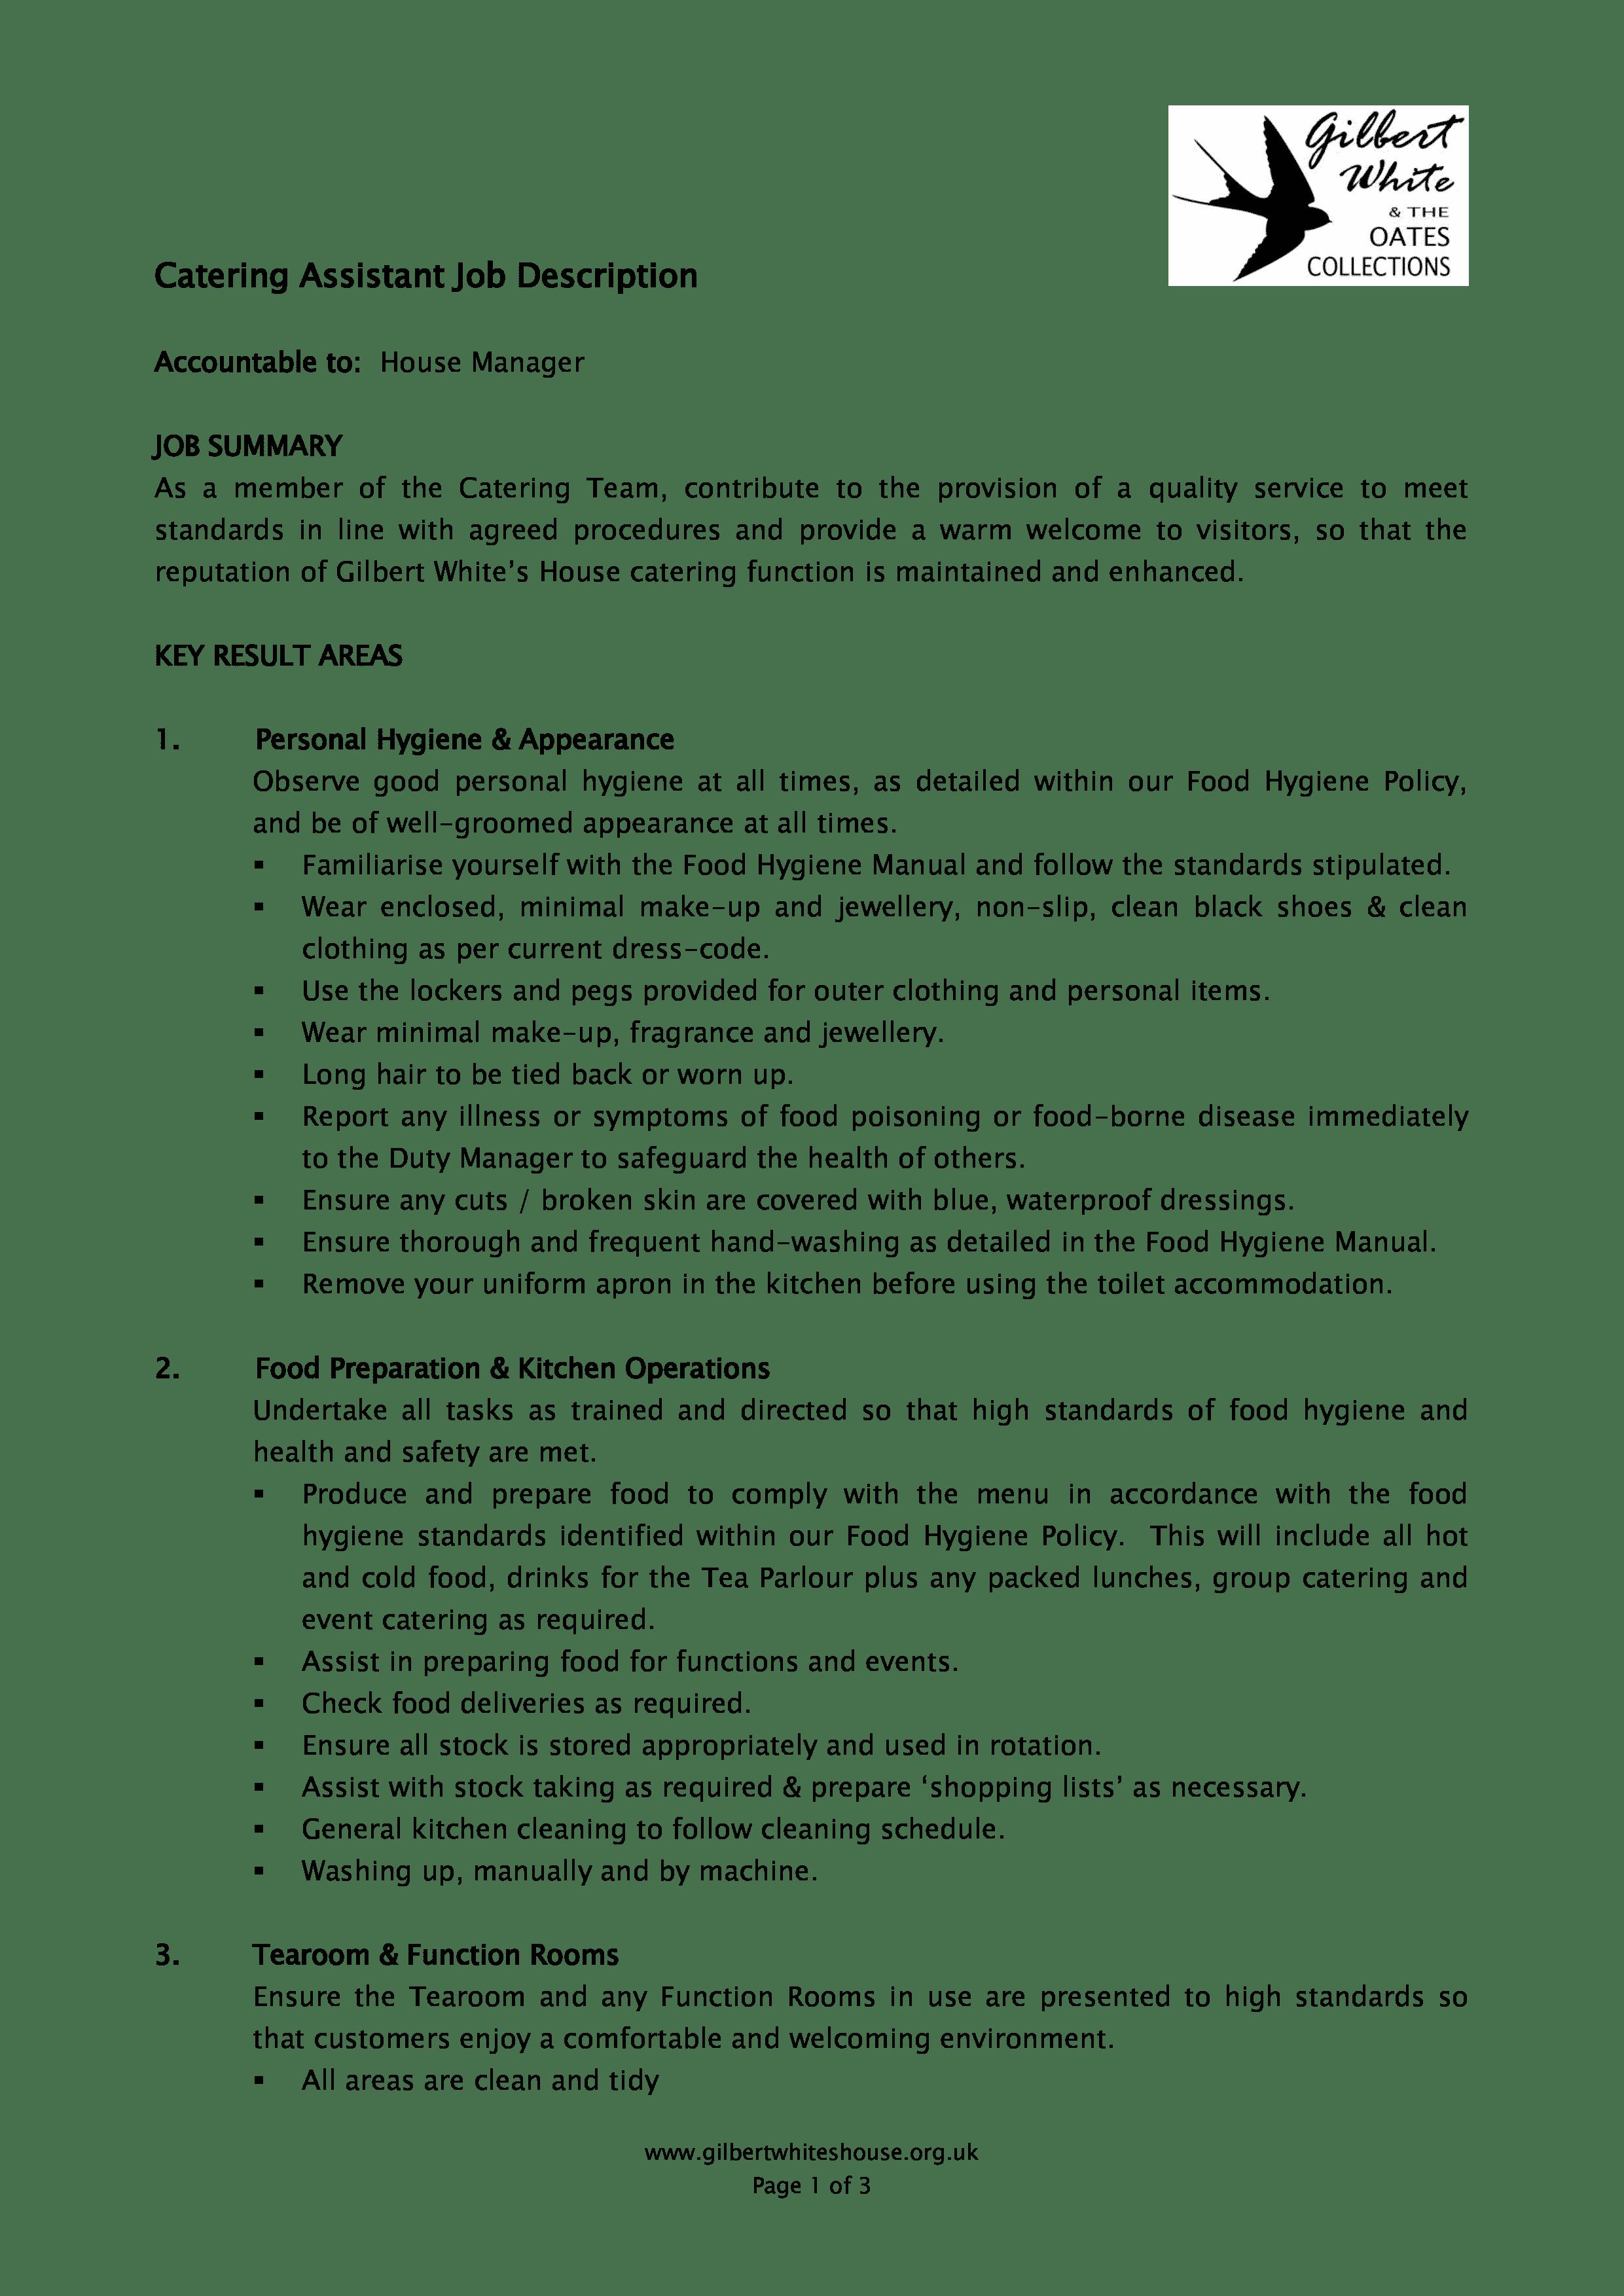 catering-assistant-job-responsibilities-2